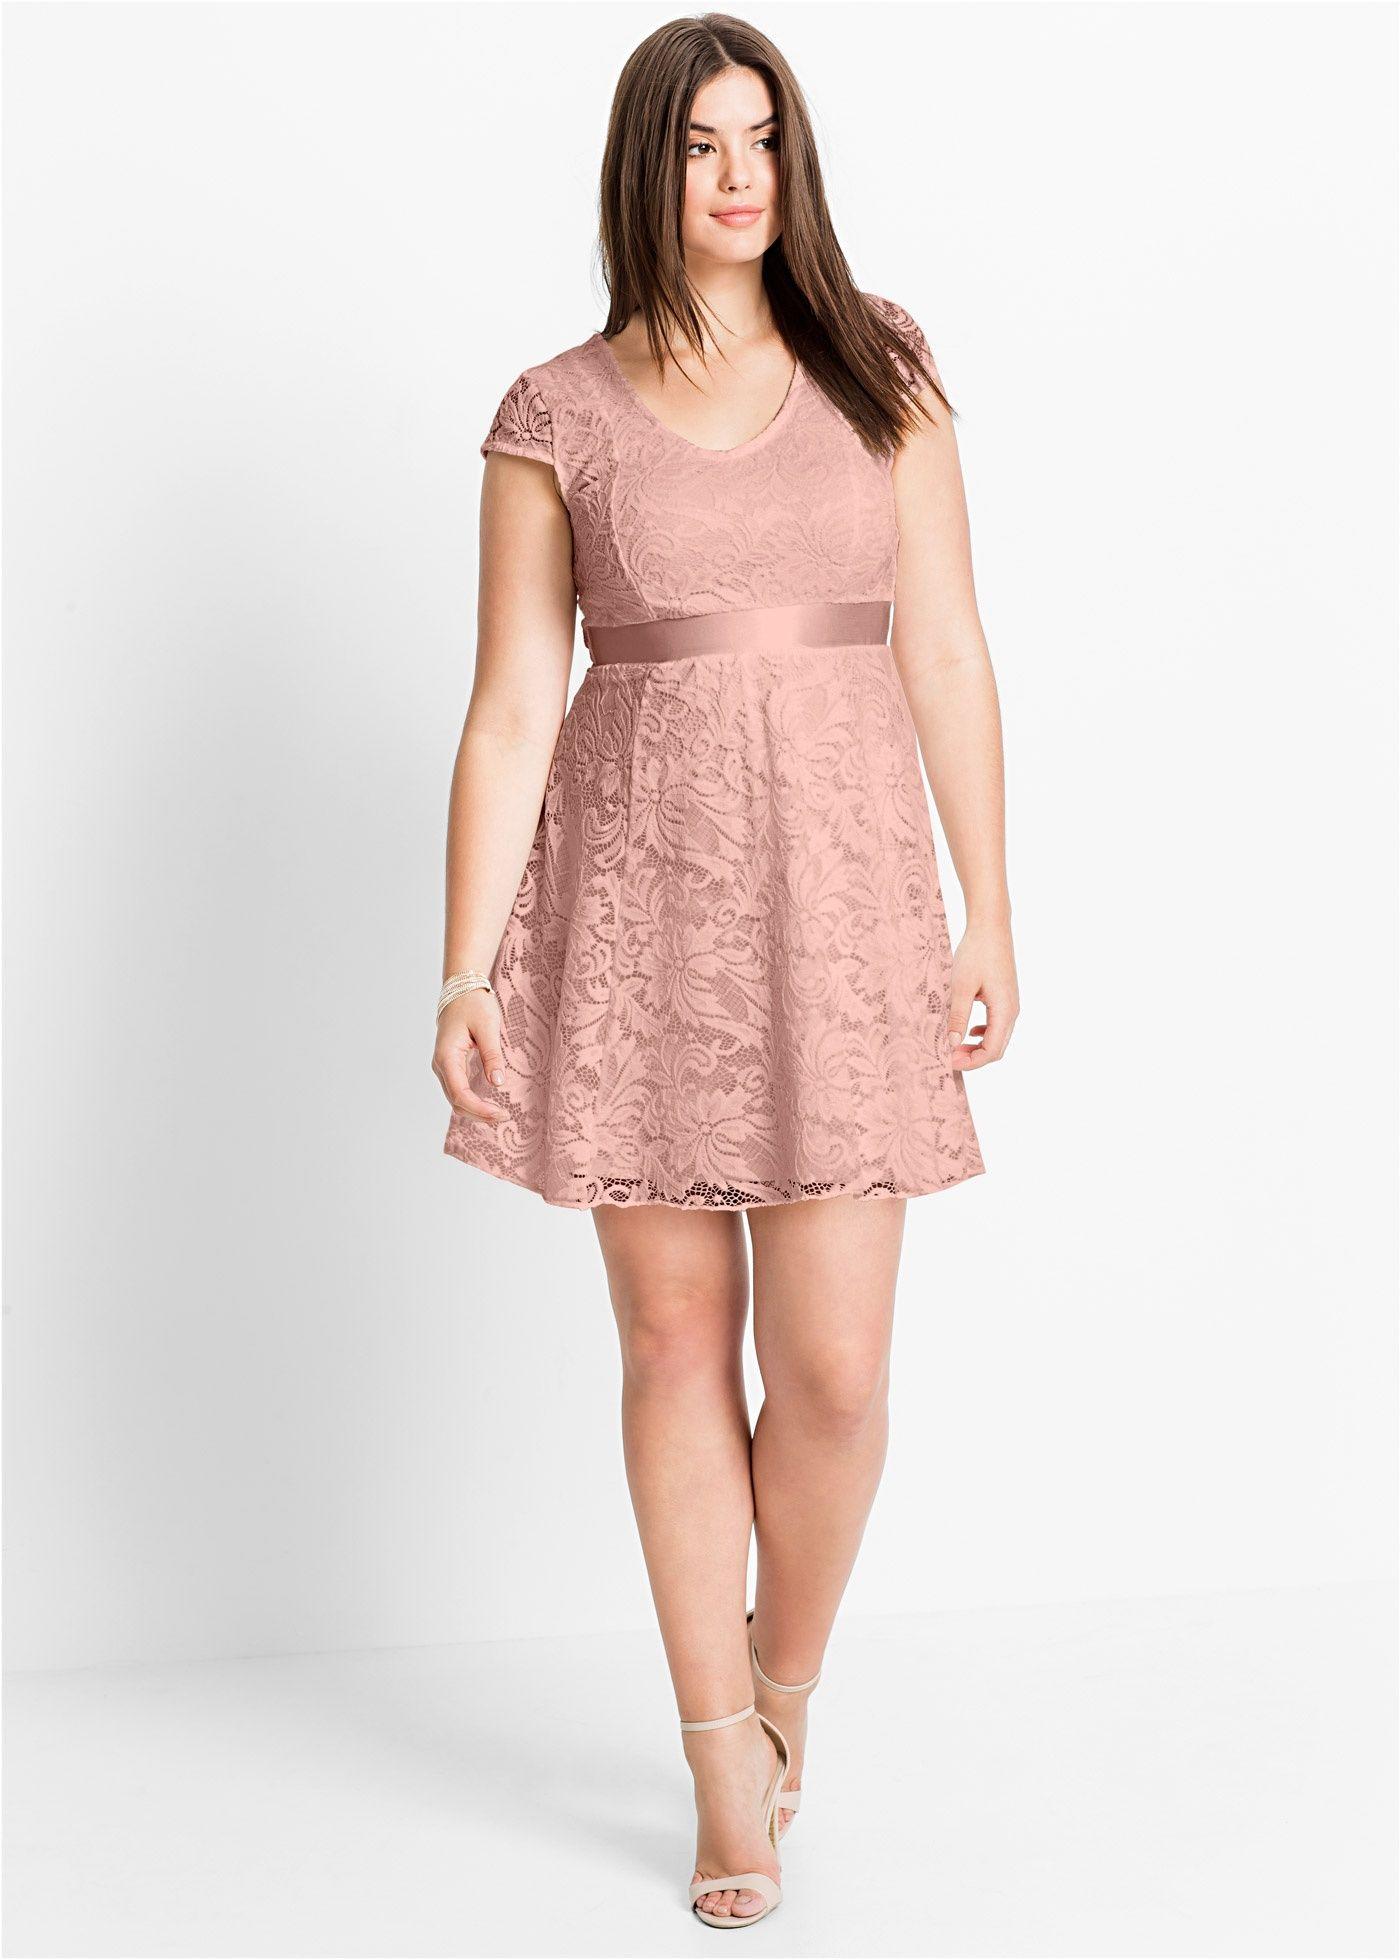 6a1a5d5fc77d08 Jerseykleid mit Spitze vintagerosa - BODYFLIRT jetzt im Online Shop von  bonprix.de ab ?